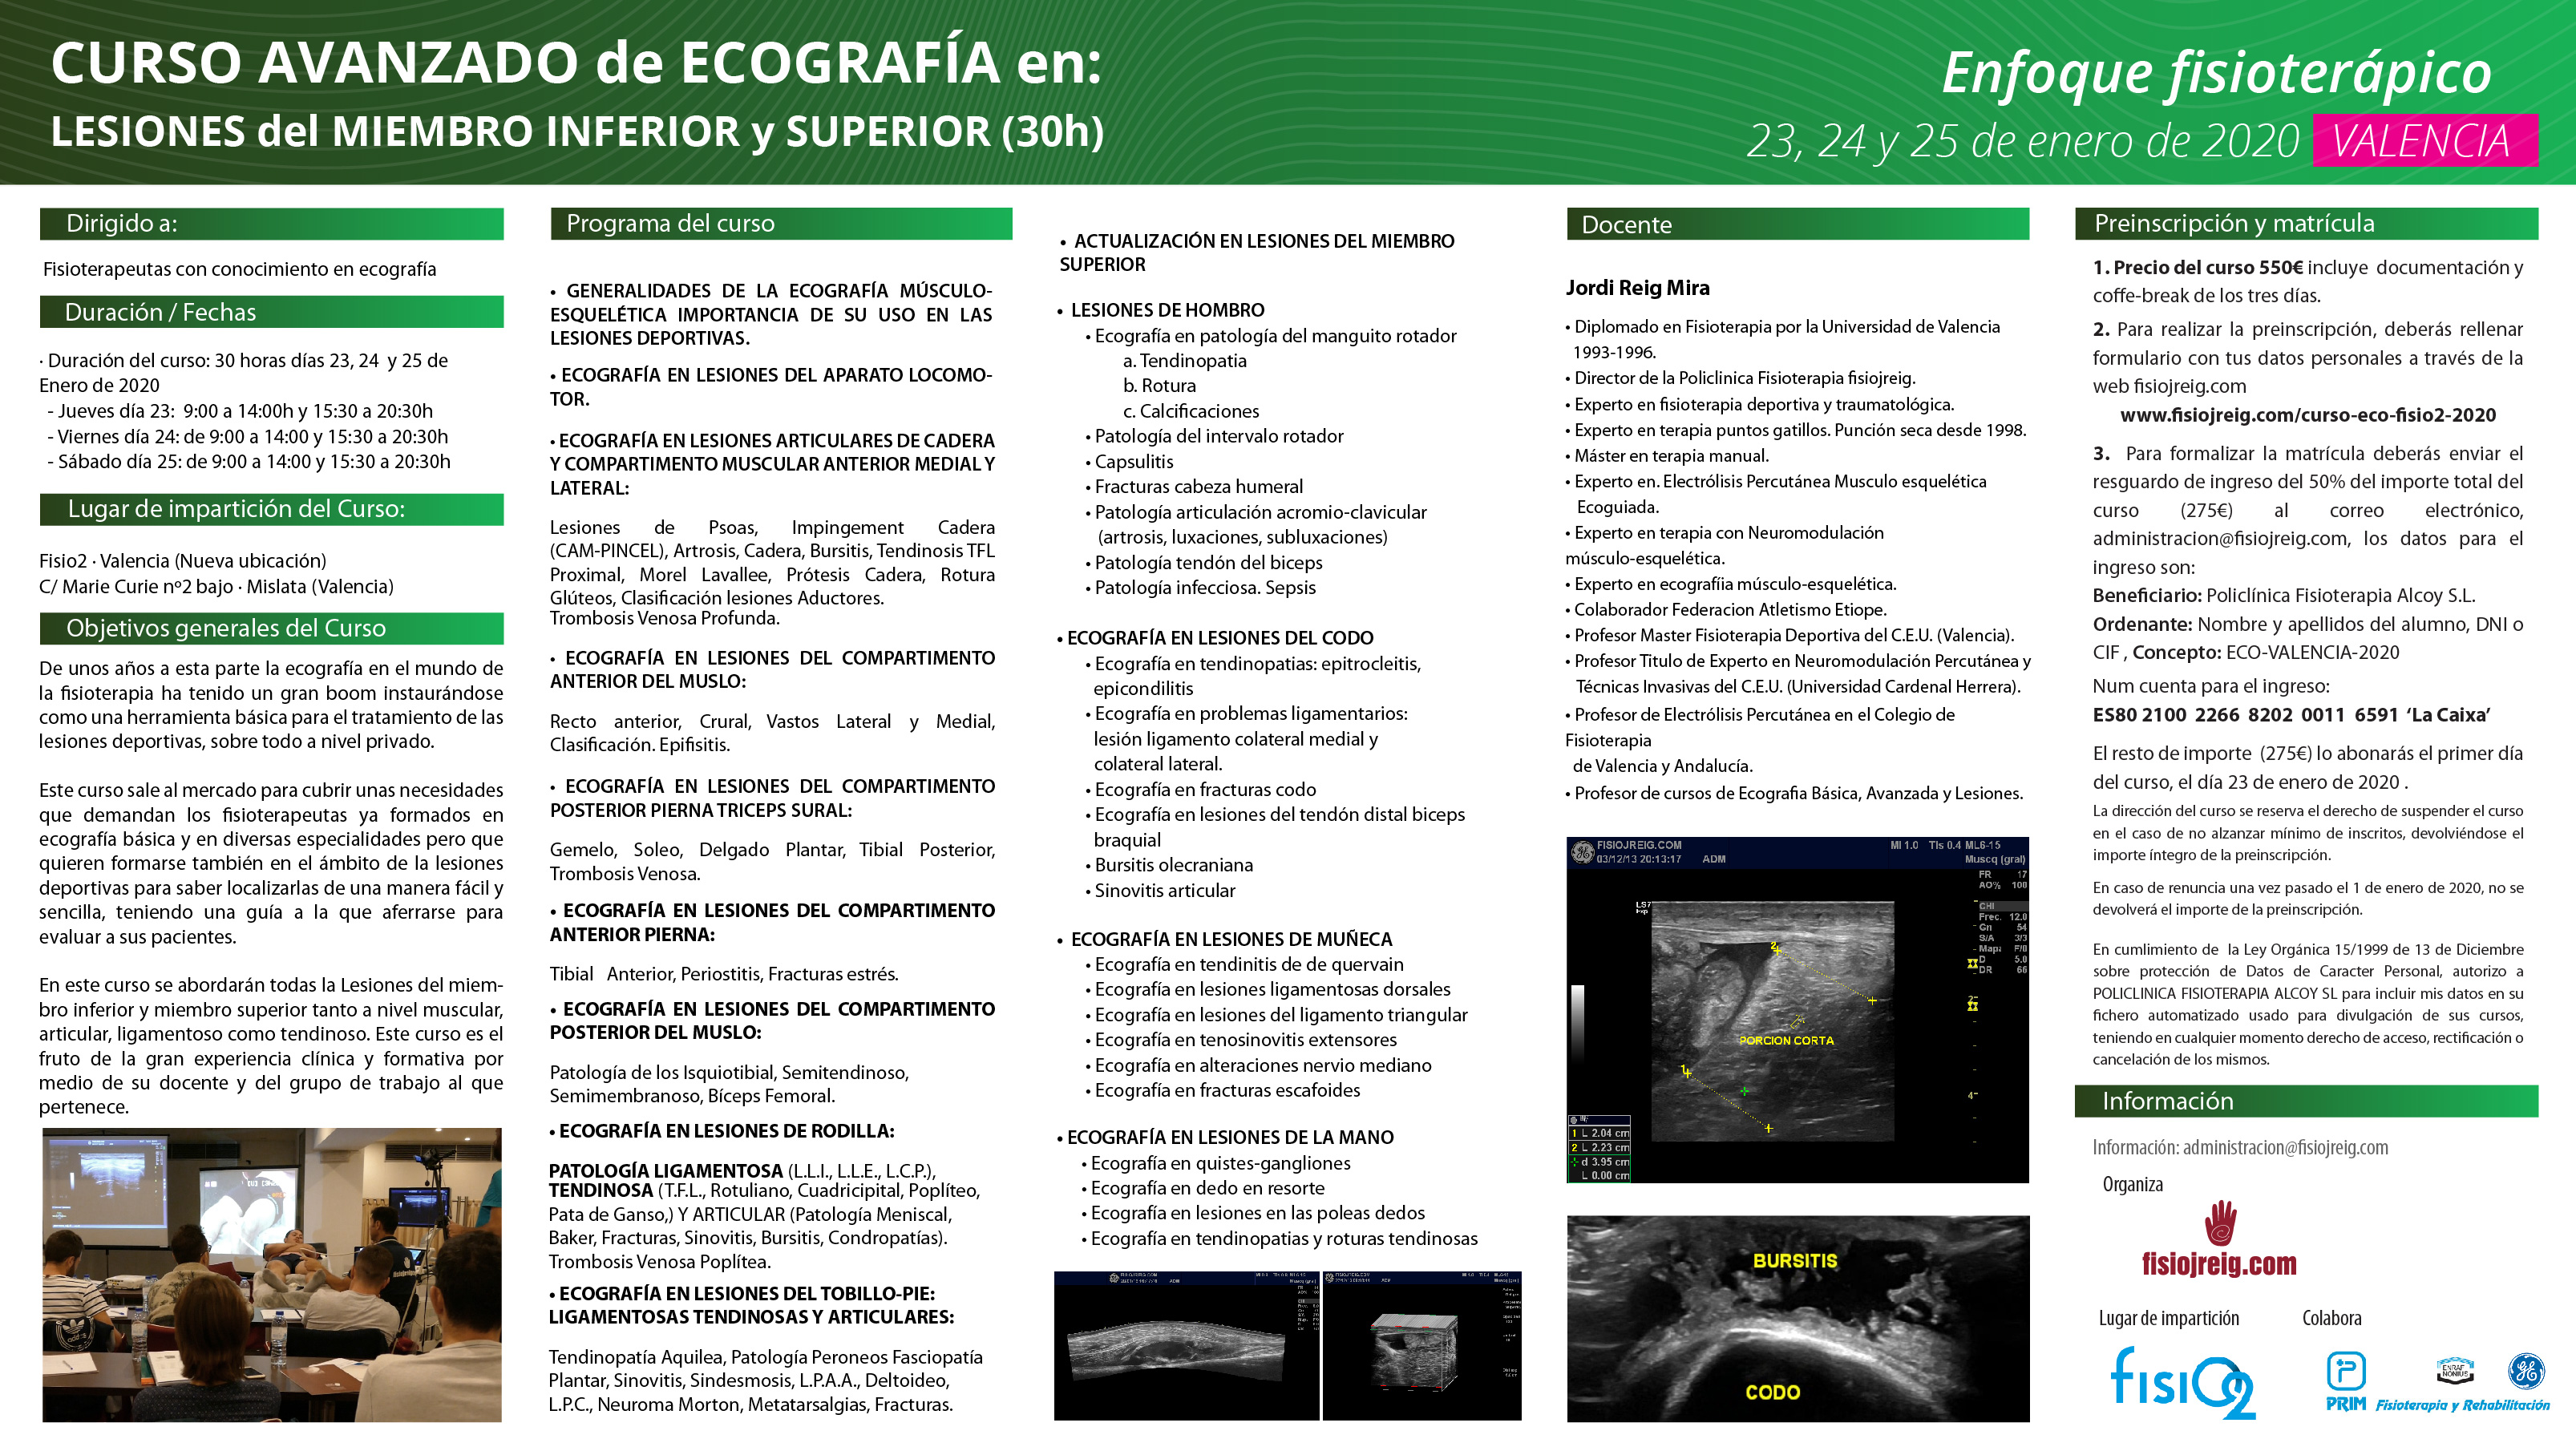 curso ecografia Valencia